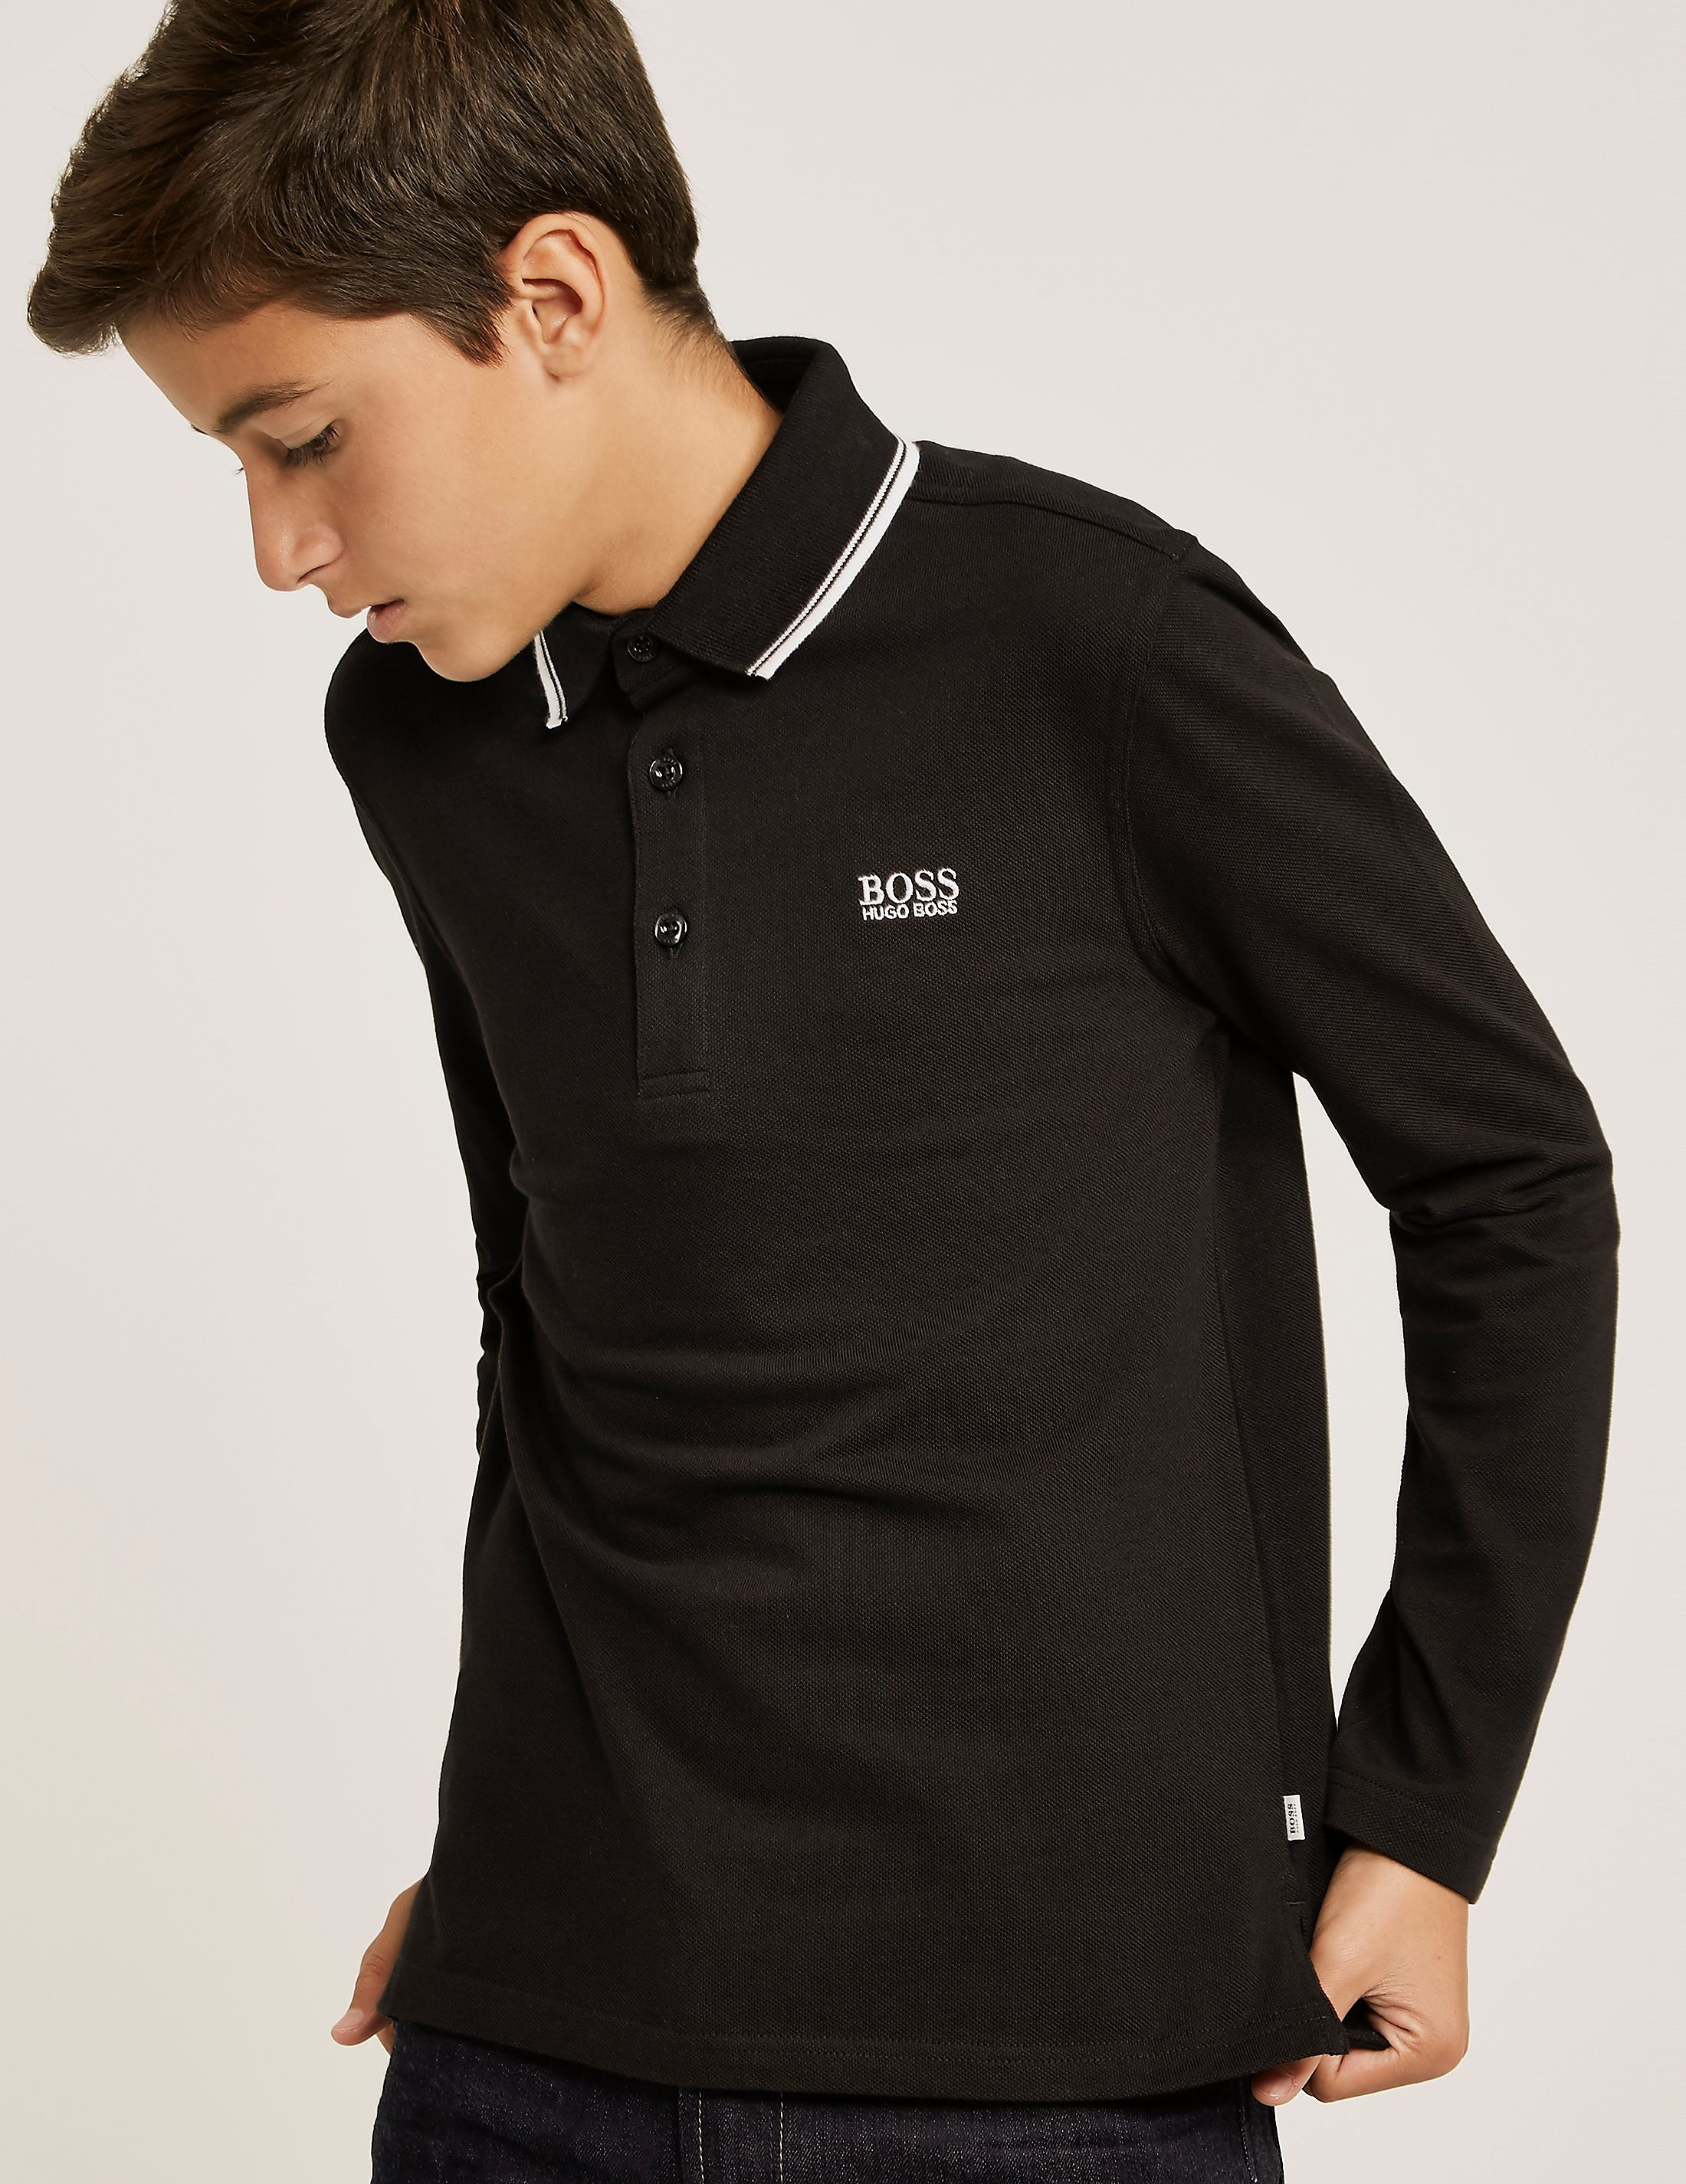 BOSS Tipped Polo Shirt